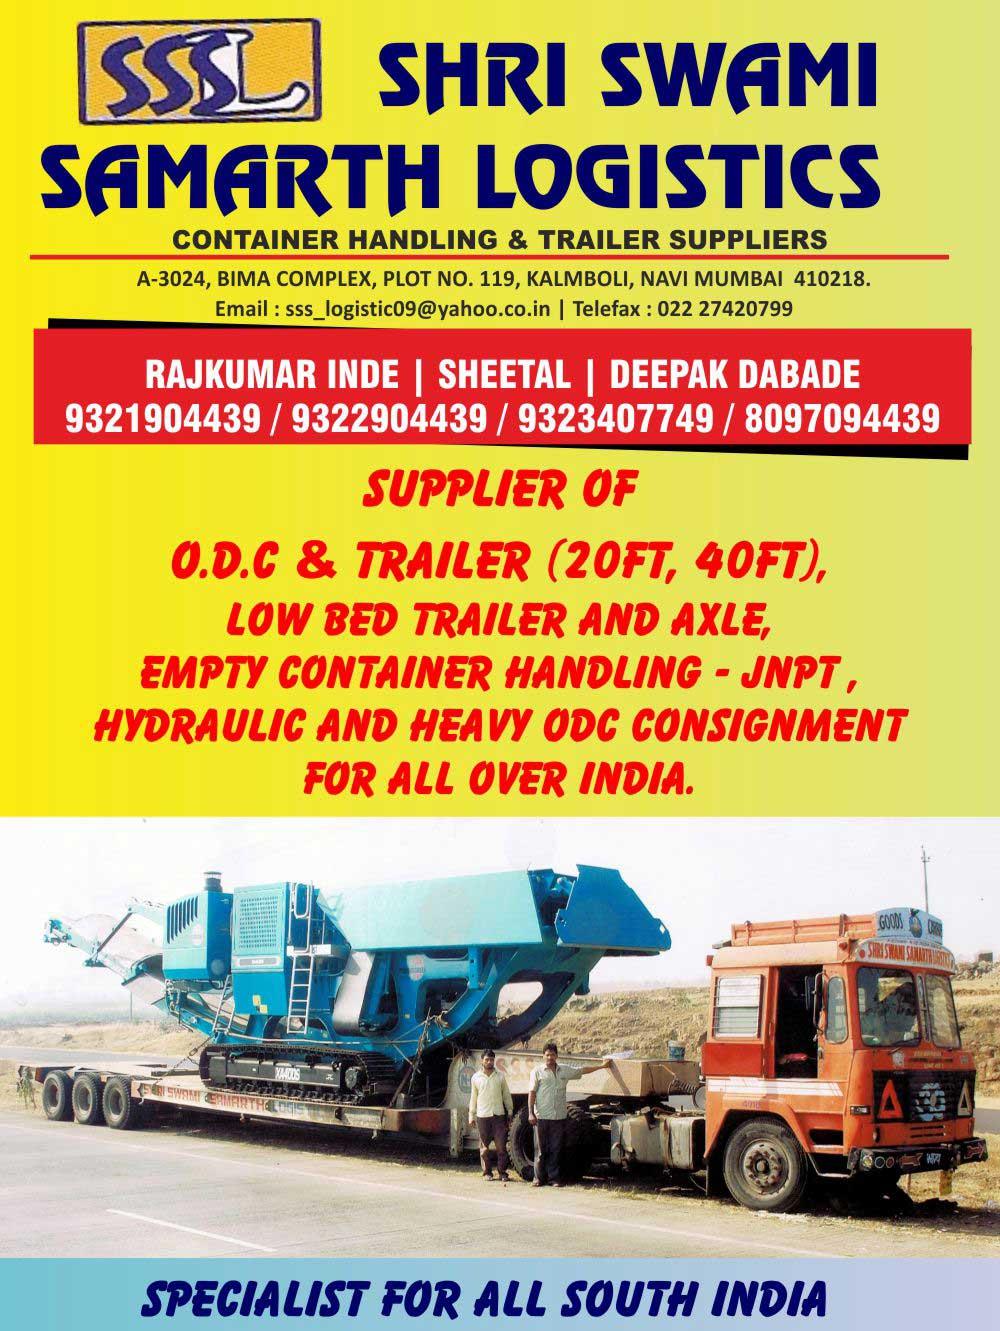 Shri Swami Samarth Logistics